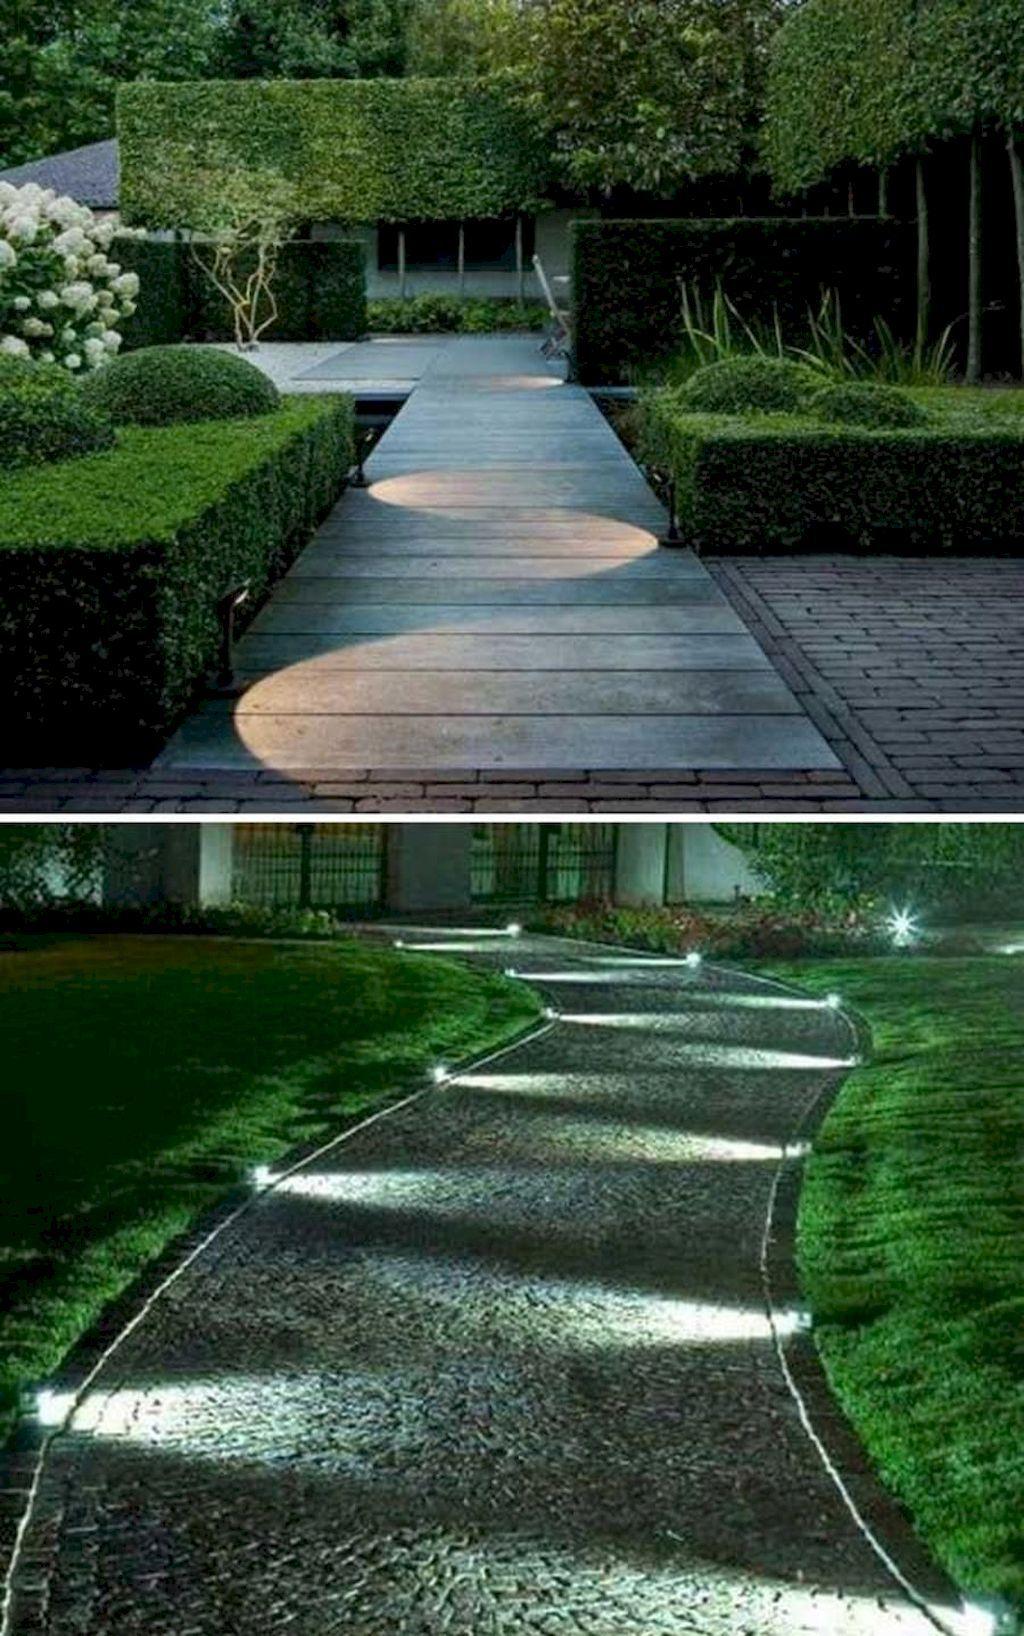 55 Easy And Creative Diy Outdoor Lighting Ideas With Images Outdoor Landscape Lighting Landscape Lighting Design Diy Outdoor Lighting